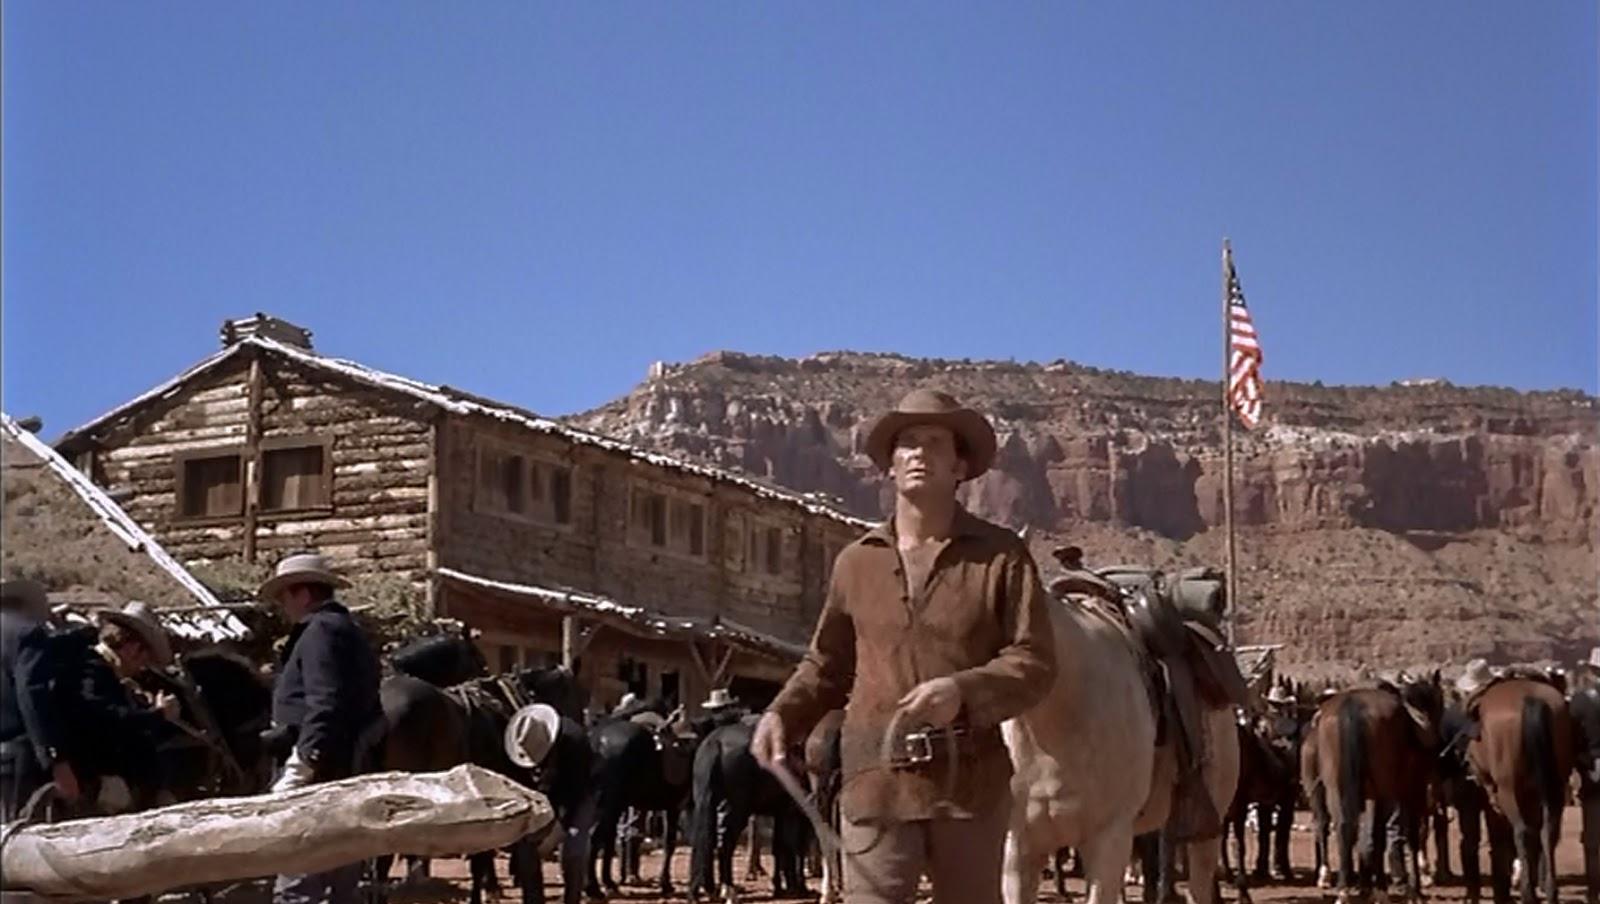 Ben Davis Ford >> HISTORY OF THE PARRY LODGE, KANAB, UTAH: Kanab Movie Fort ...